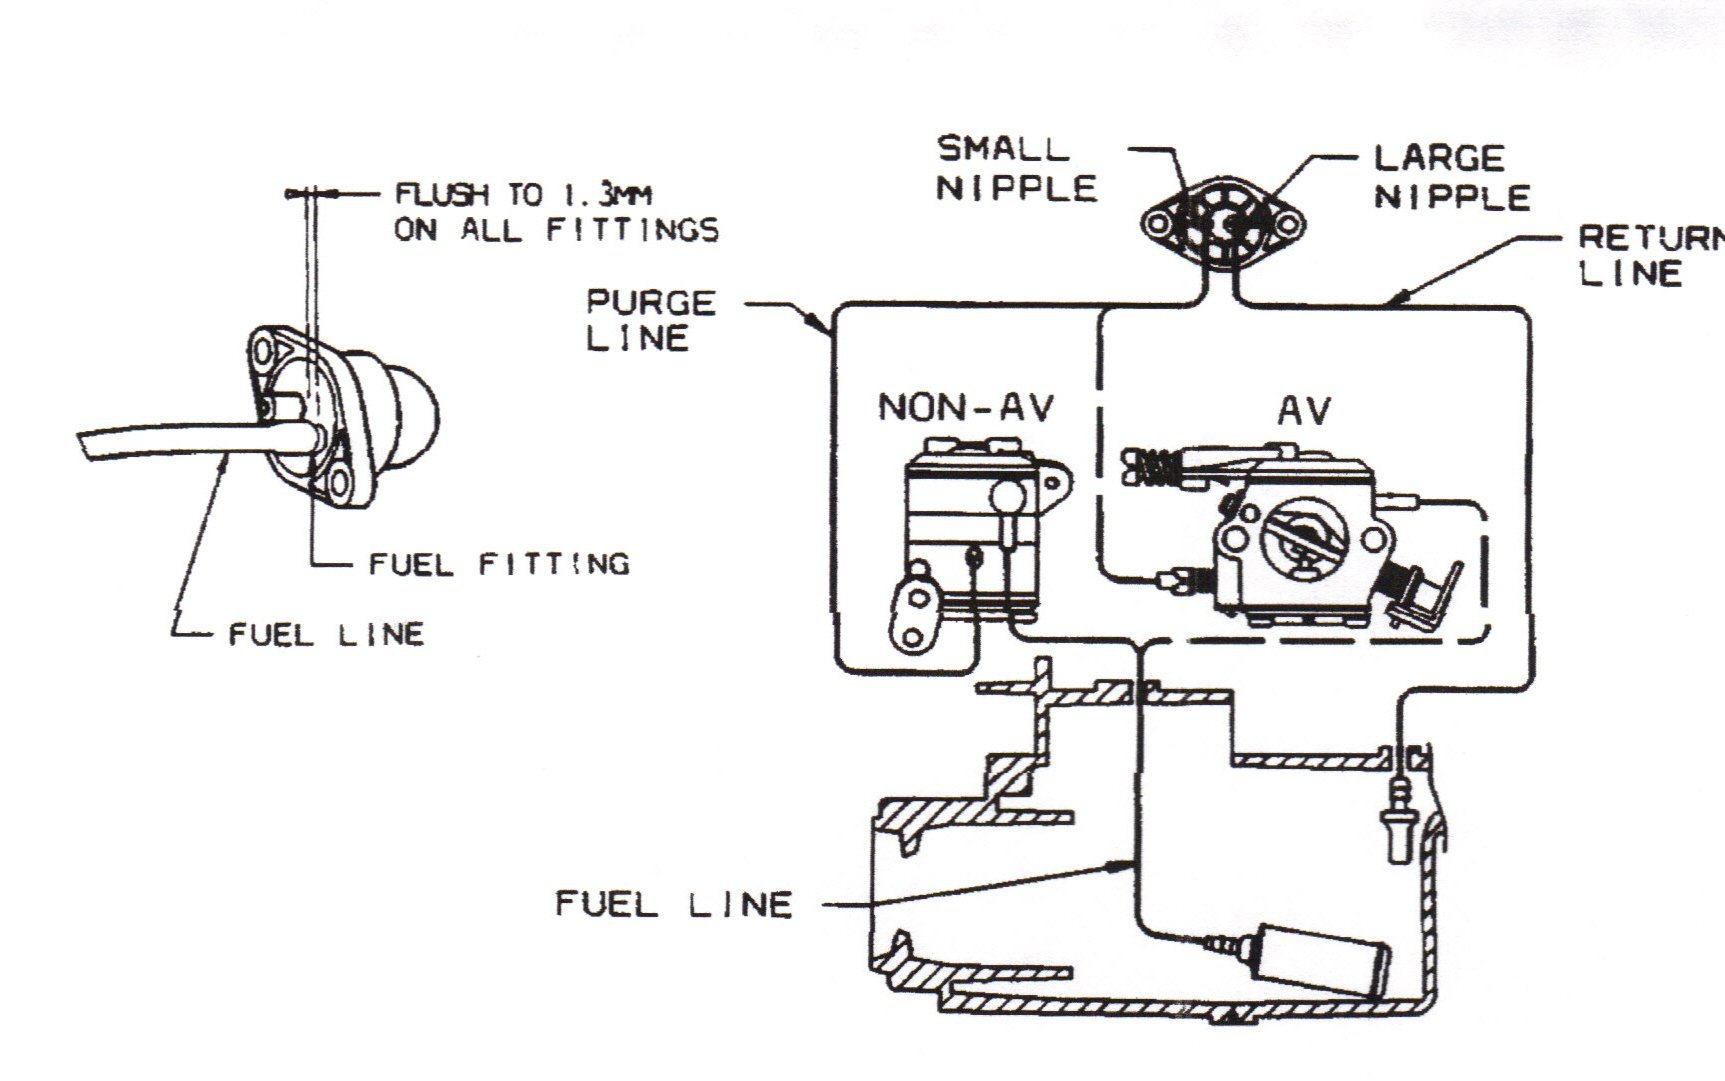 i am looking for a fuel line diagram for ryobi bp 42 blower rh justanswer com fuel line diagram for 911 fuel line diagram for poulan pro weedeater